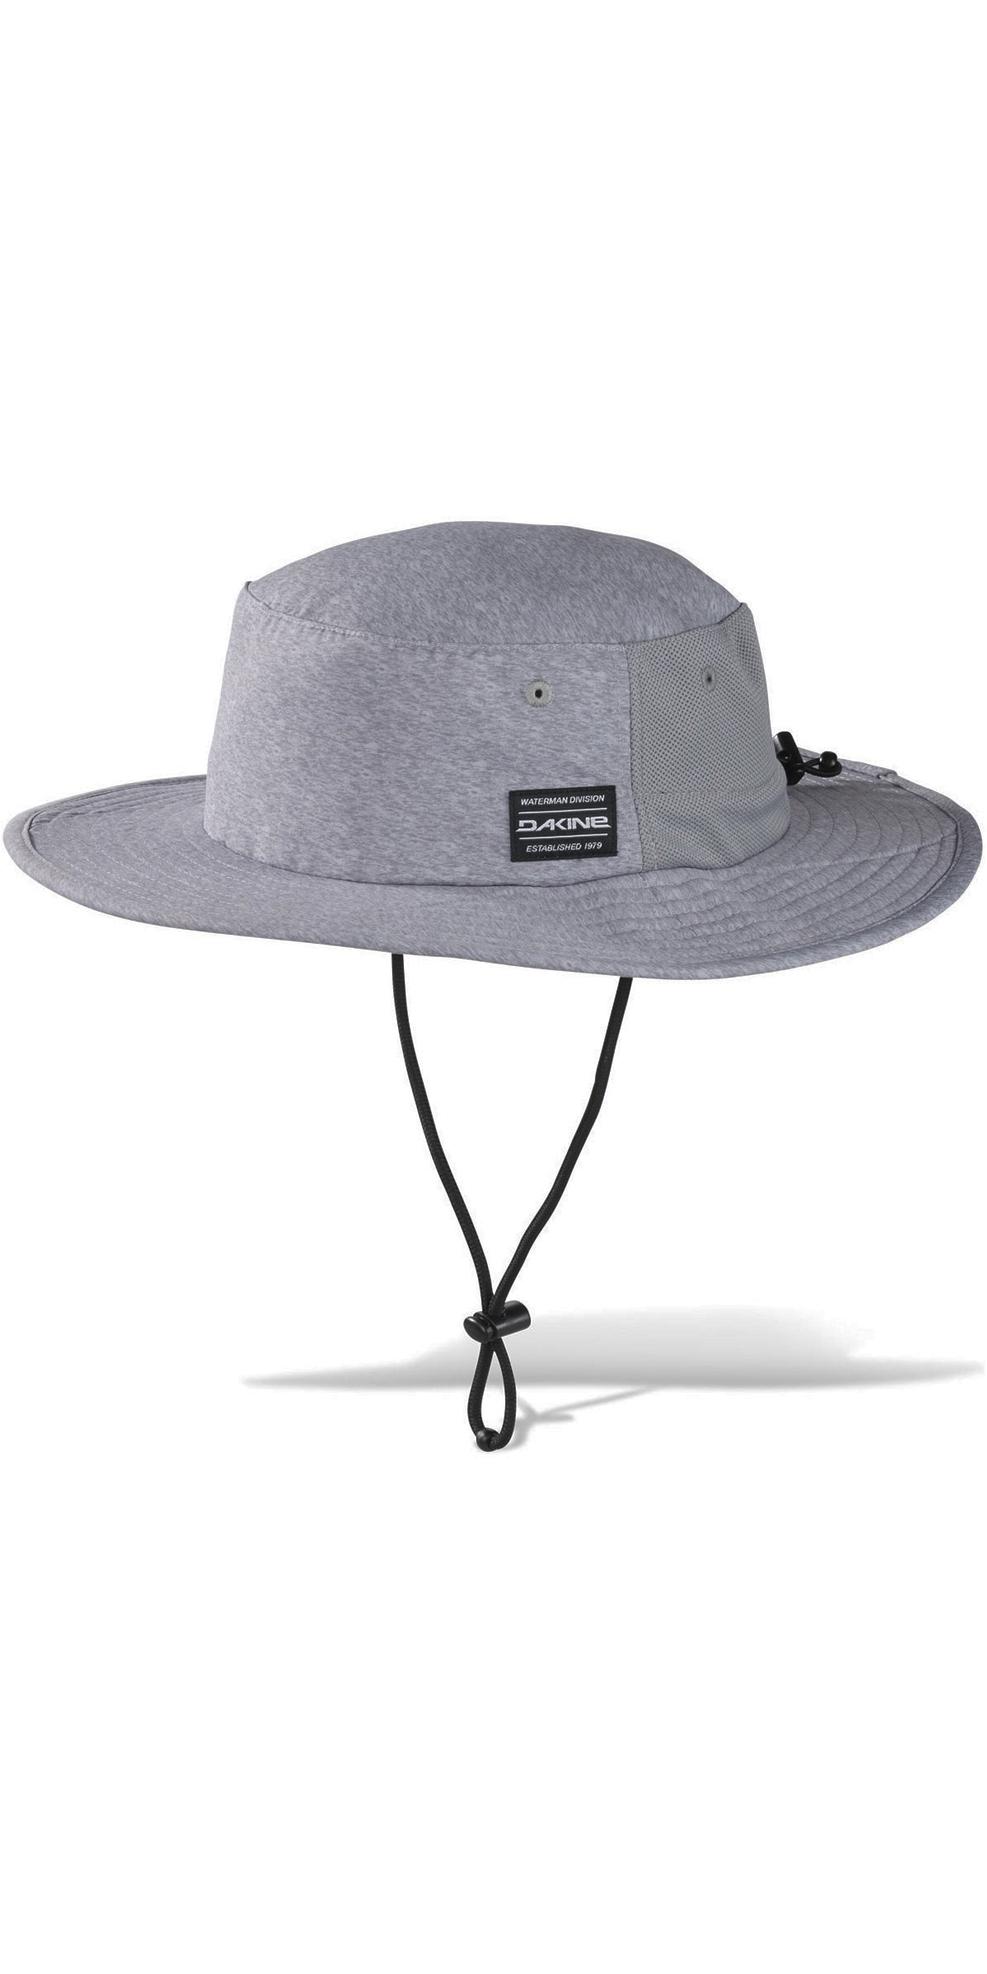 2019 Dakine No Zone Hat Grey 10002458